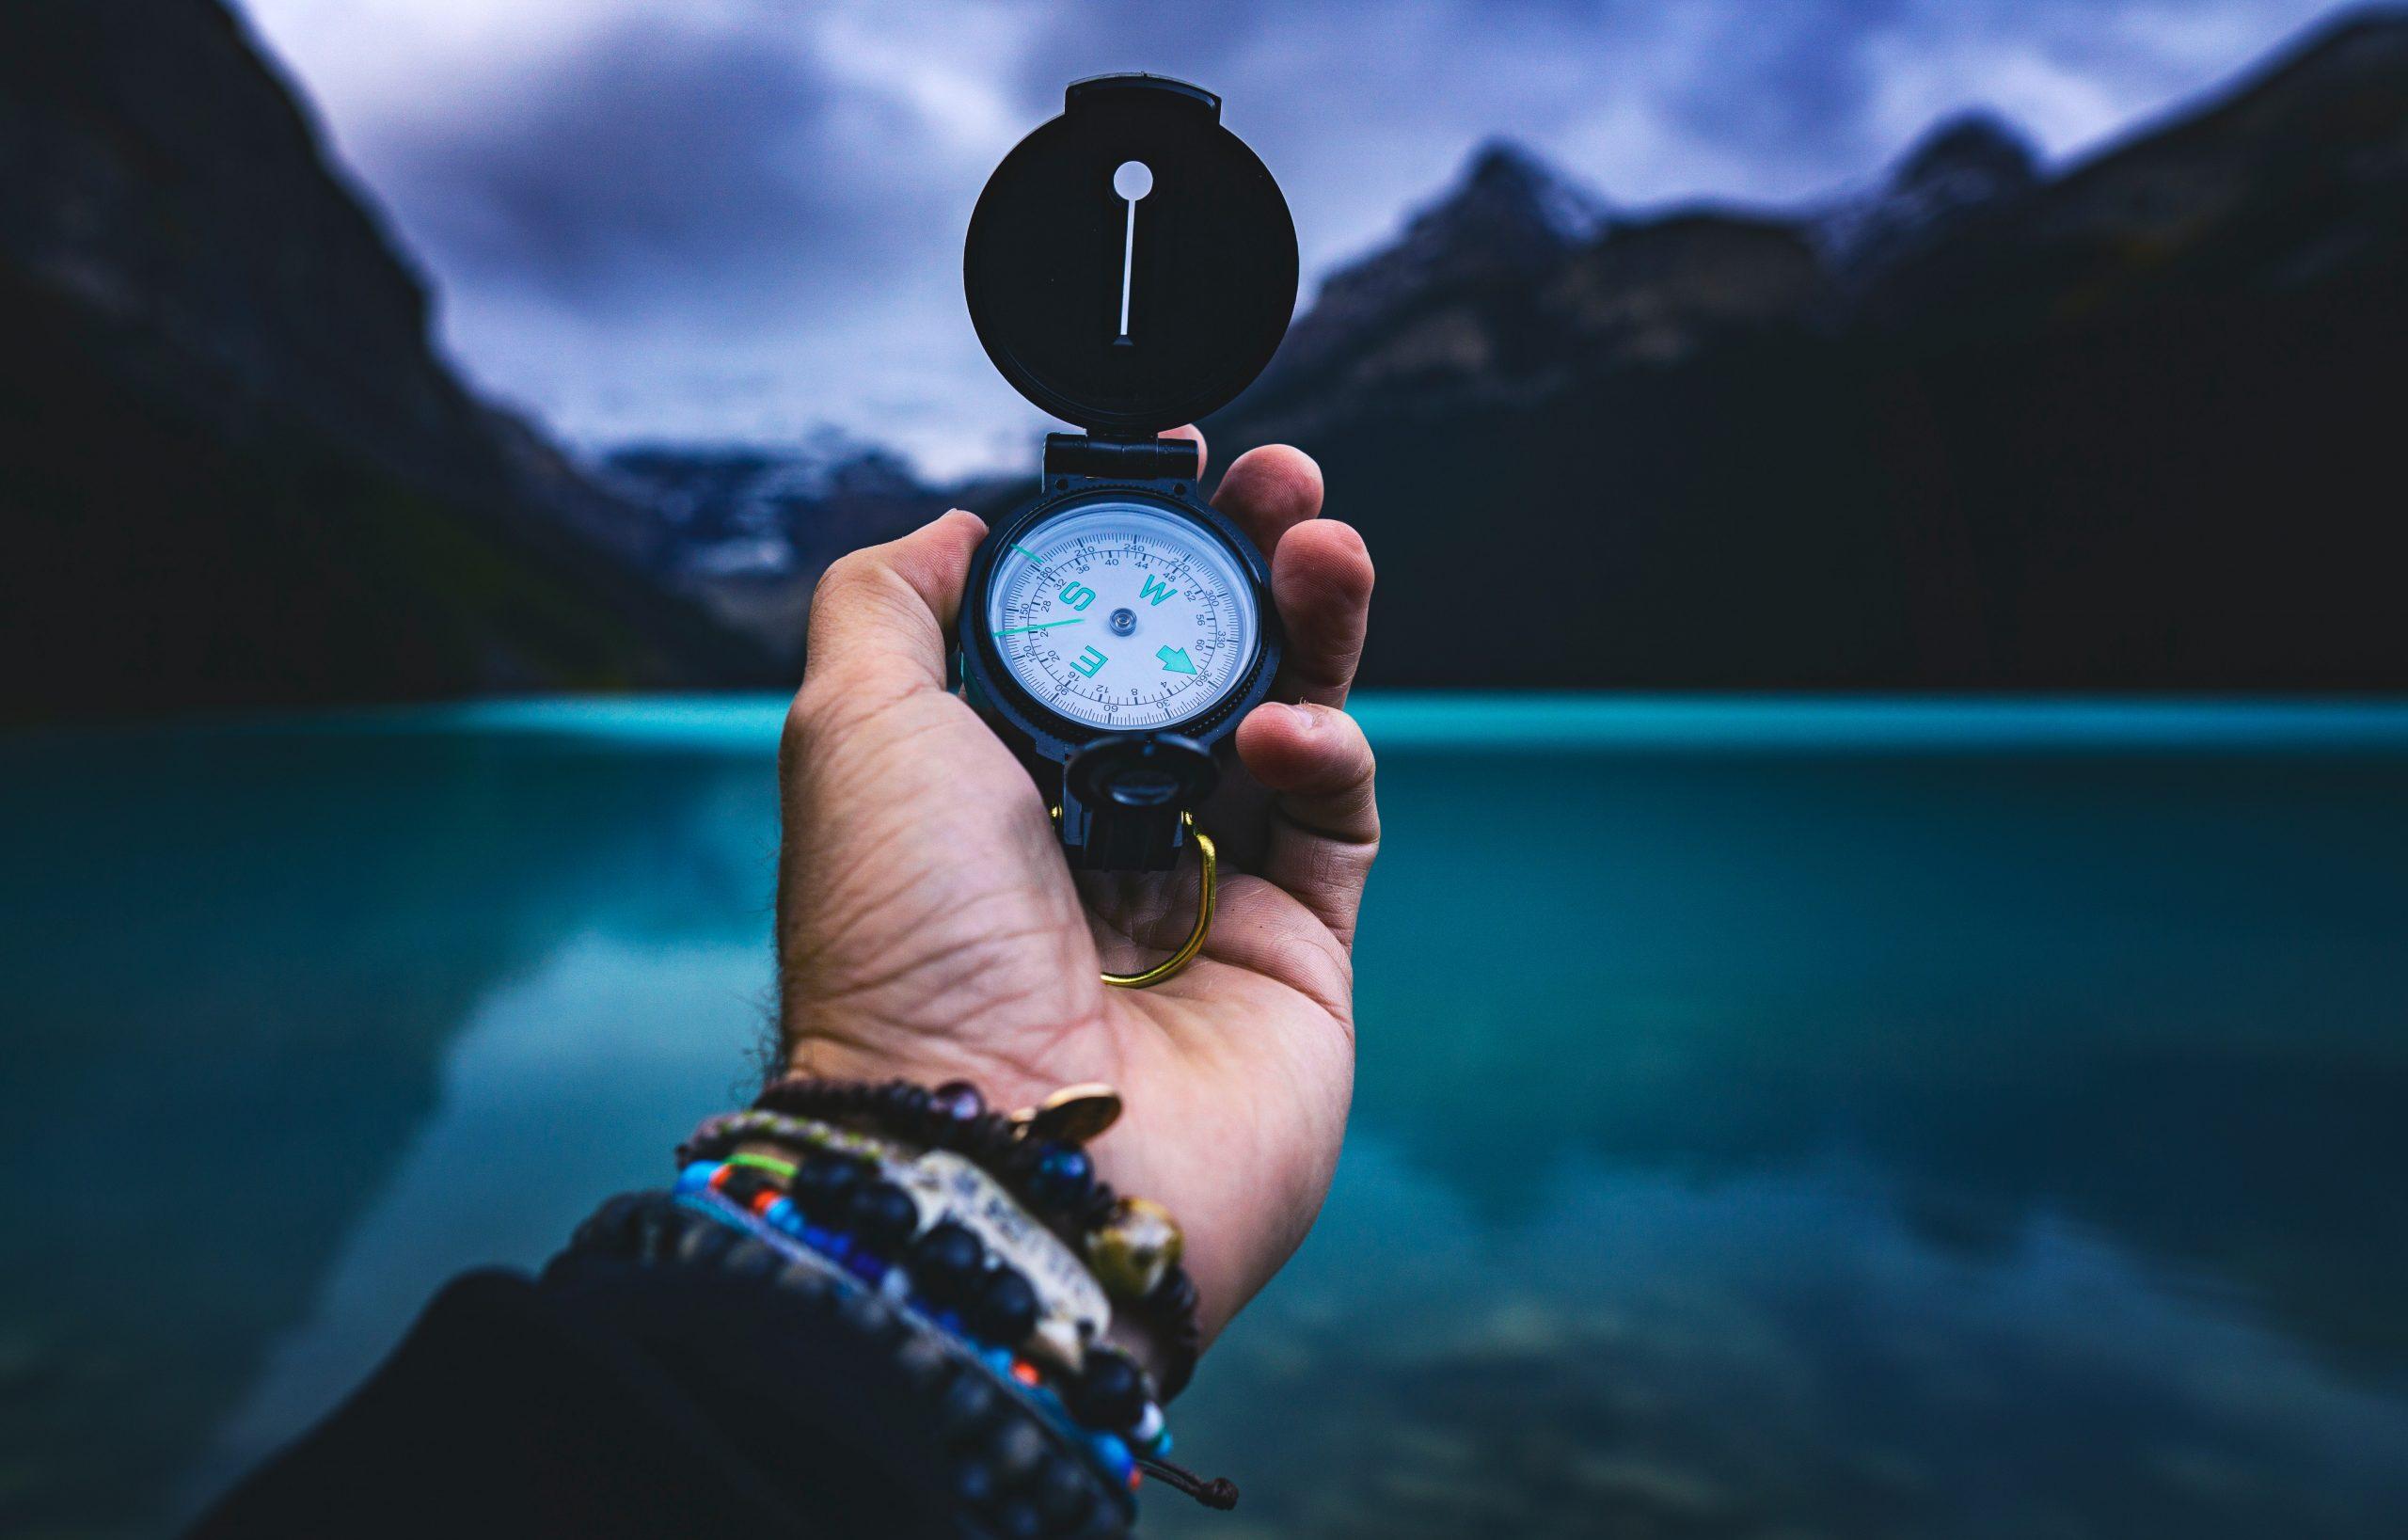 Finders: Compensation for Connecting Investors & Startups